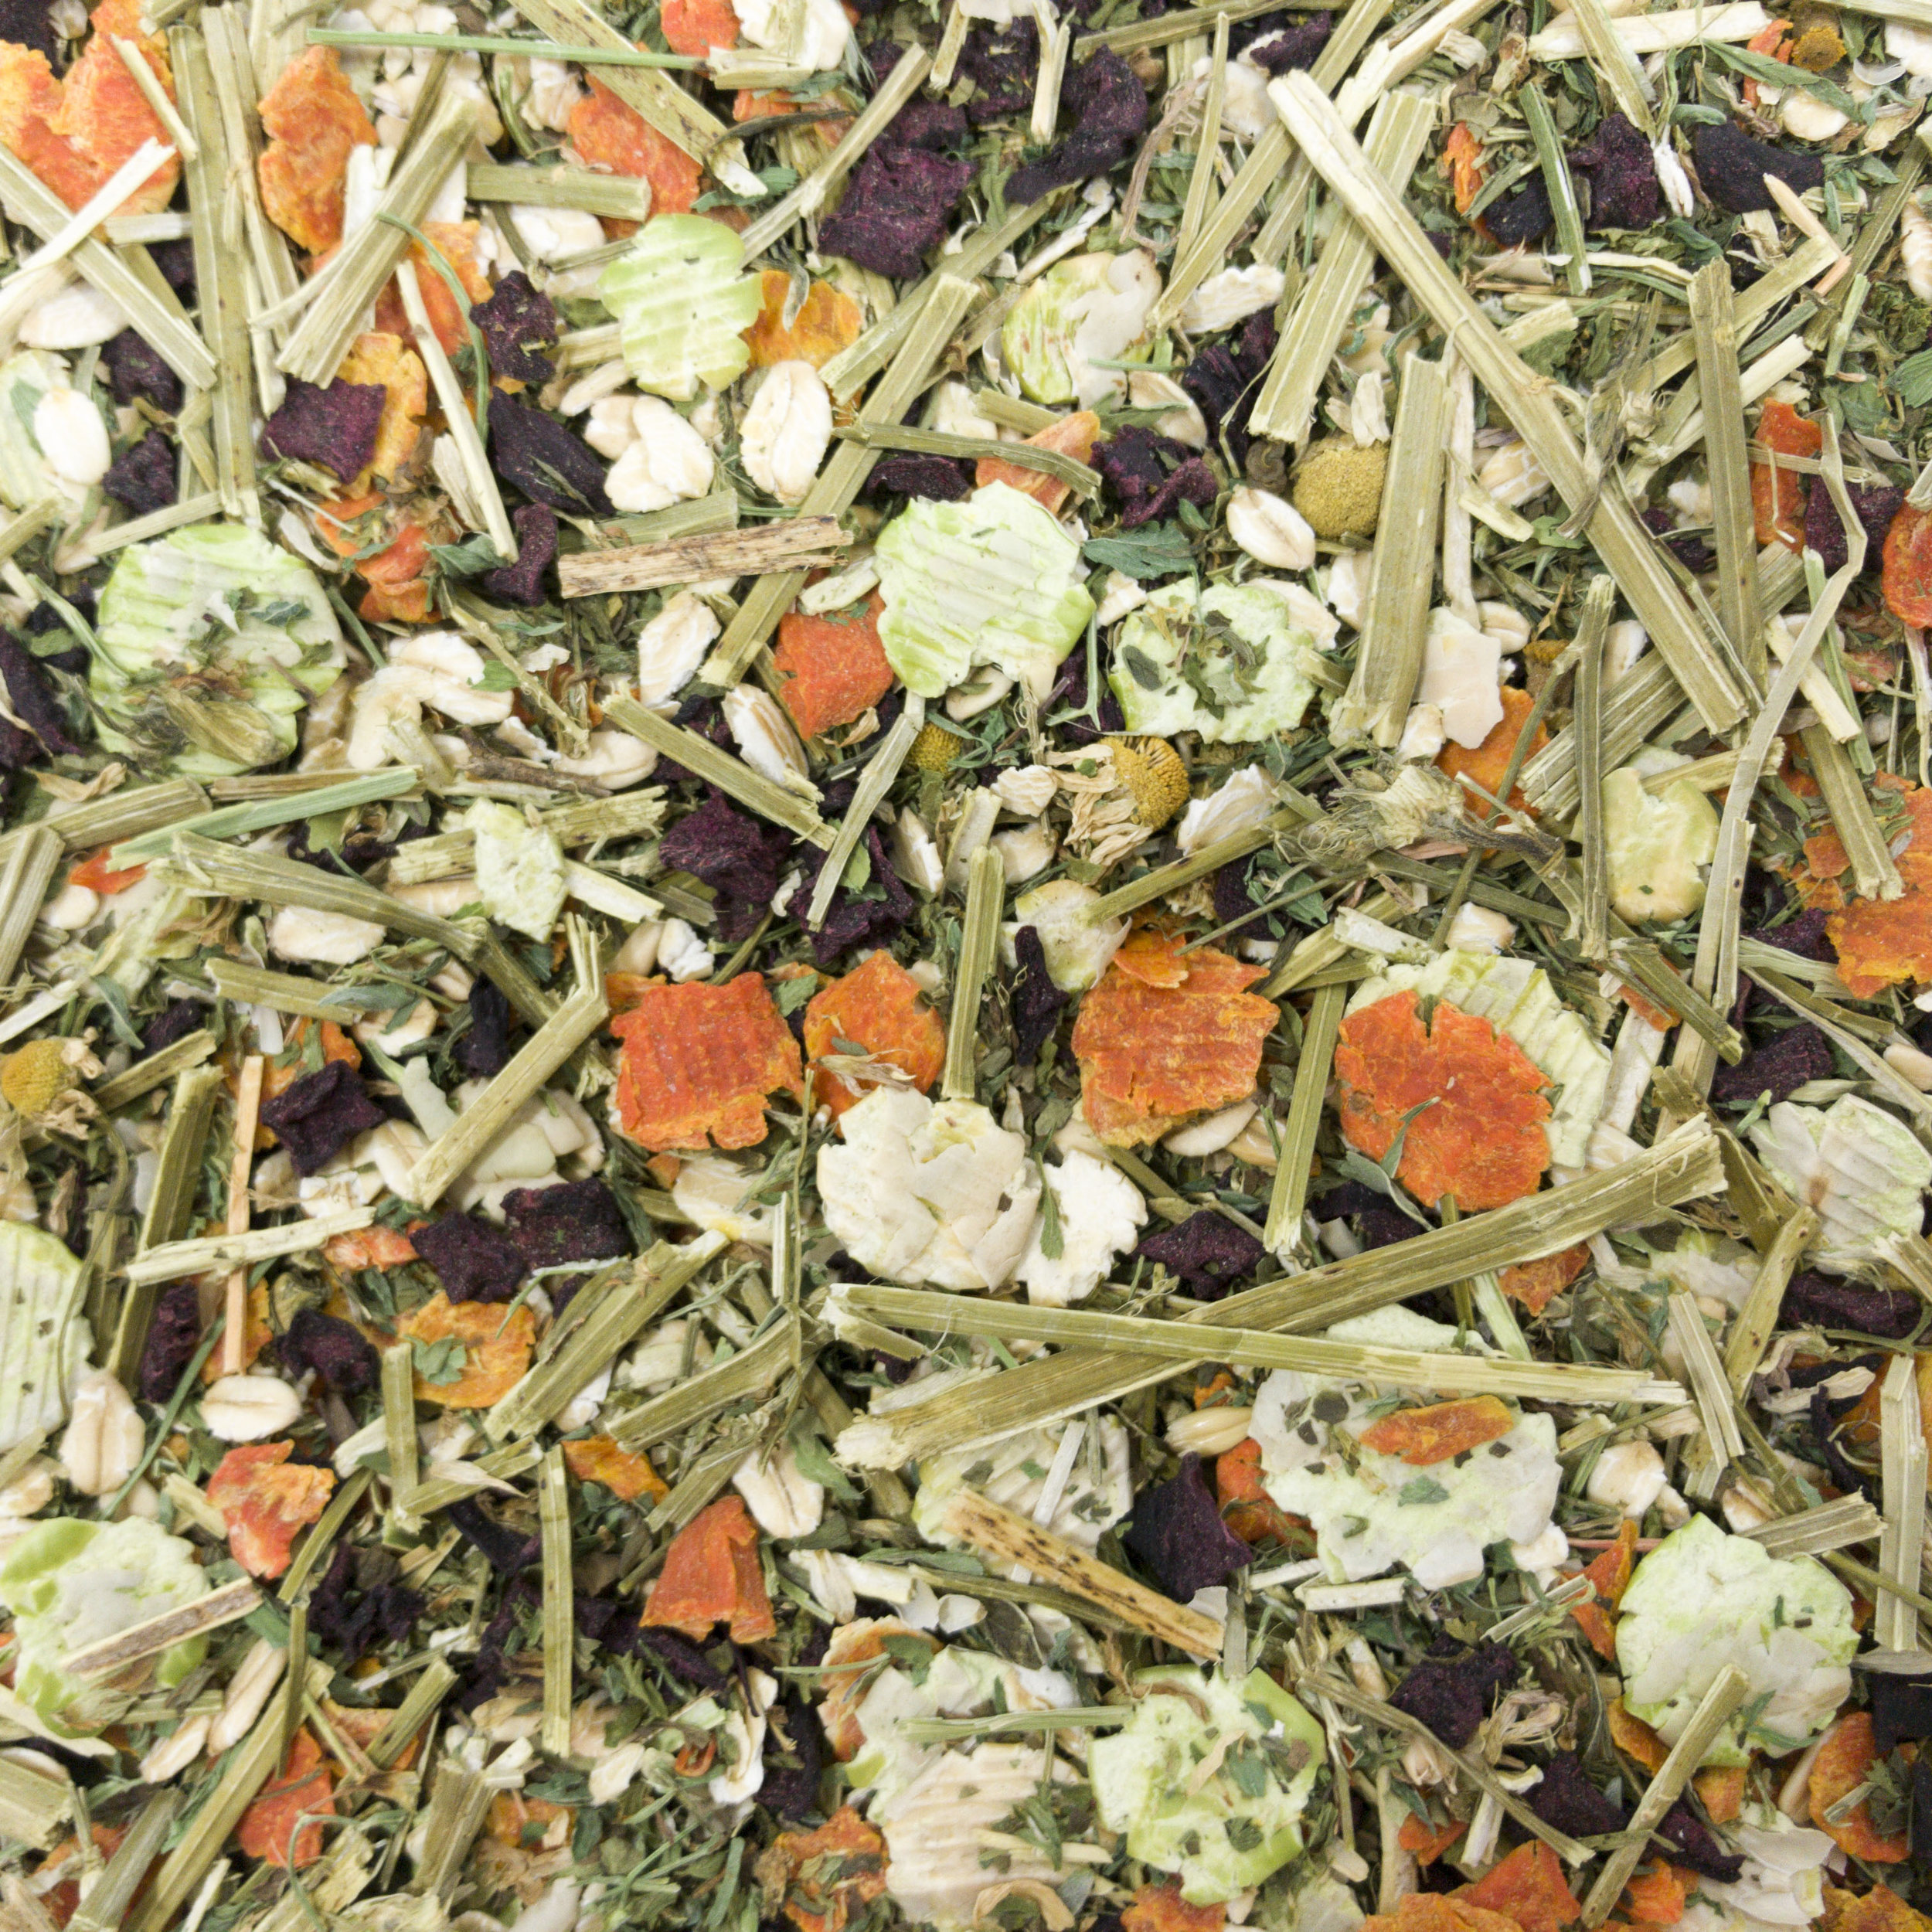 Sunburst Treats_Herb Garden_Web.jpg